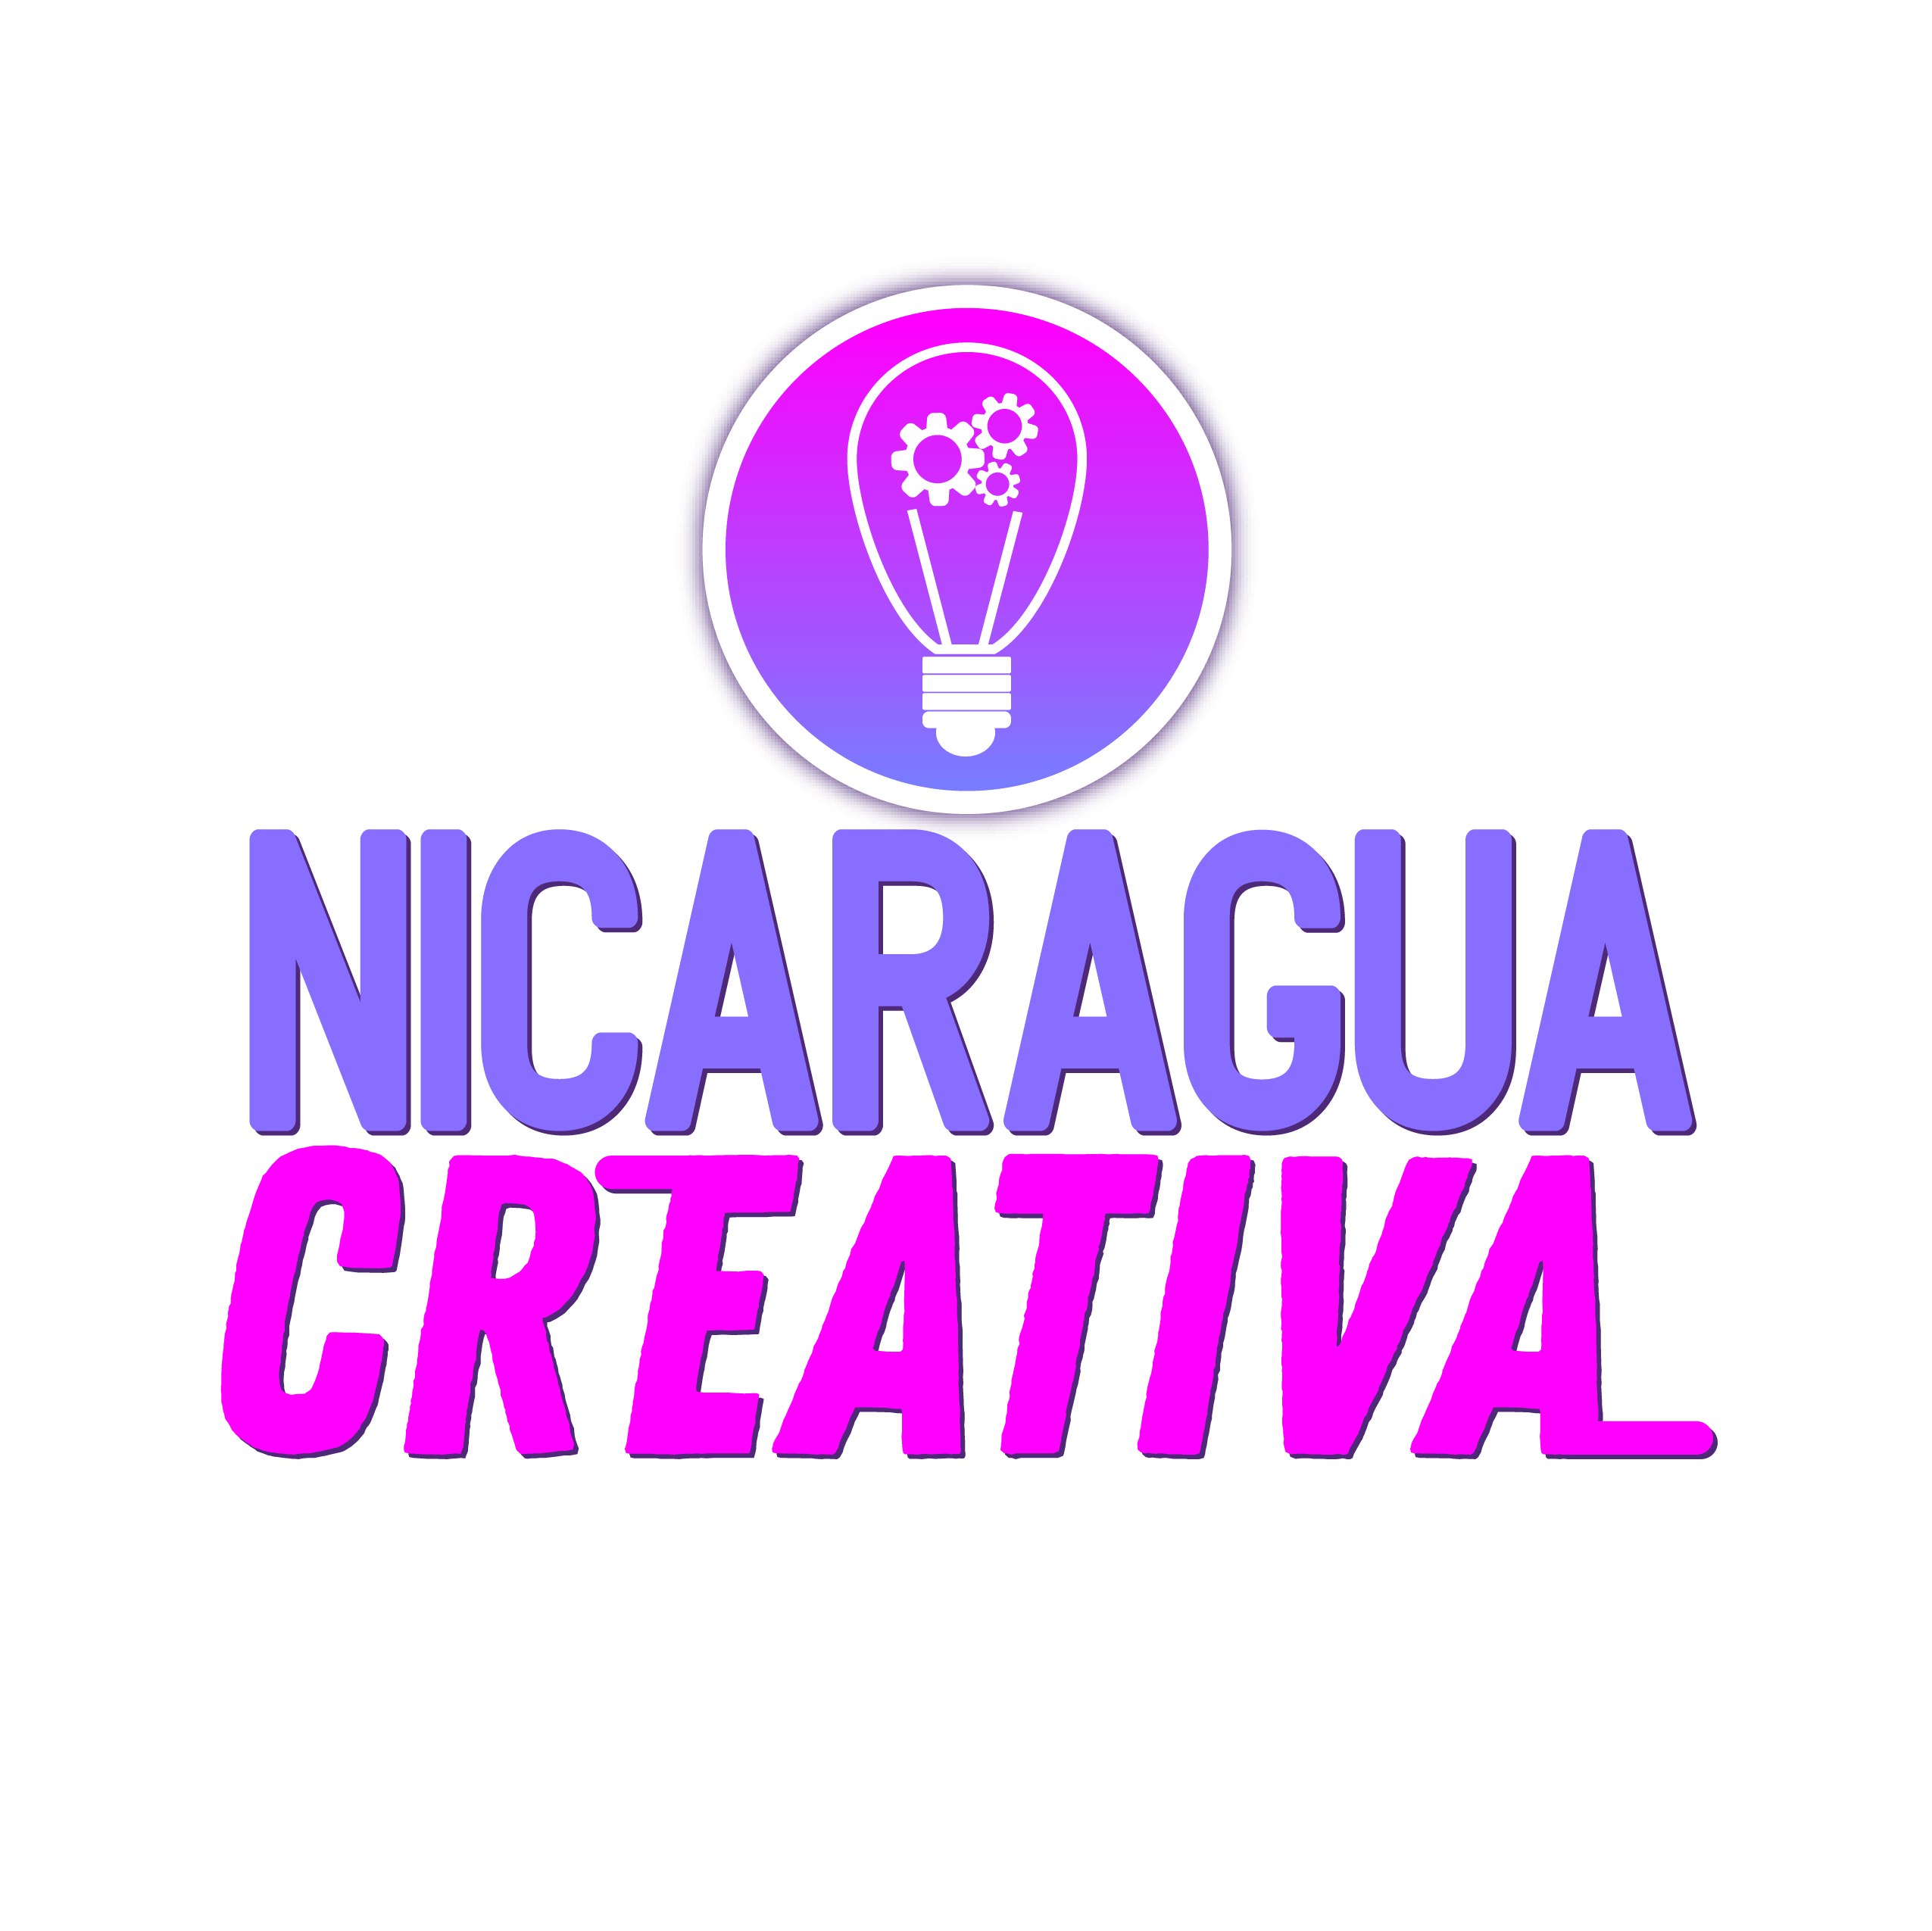 Logo Nicaragua Creativa